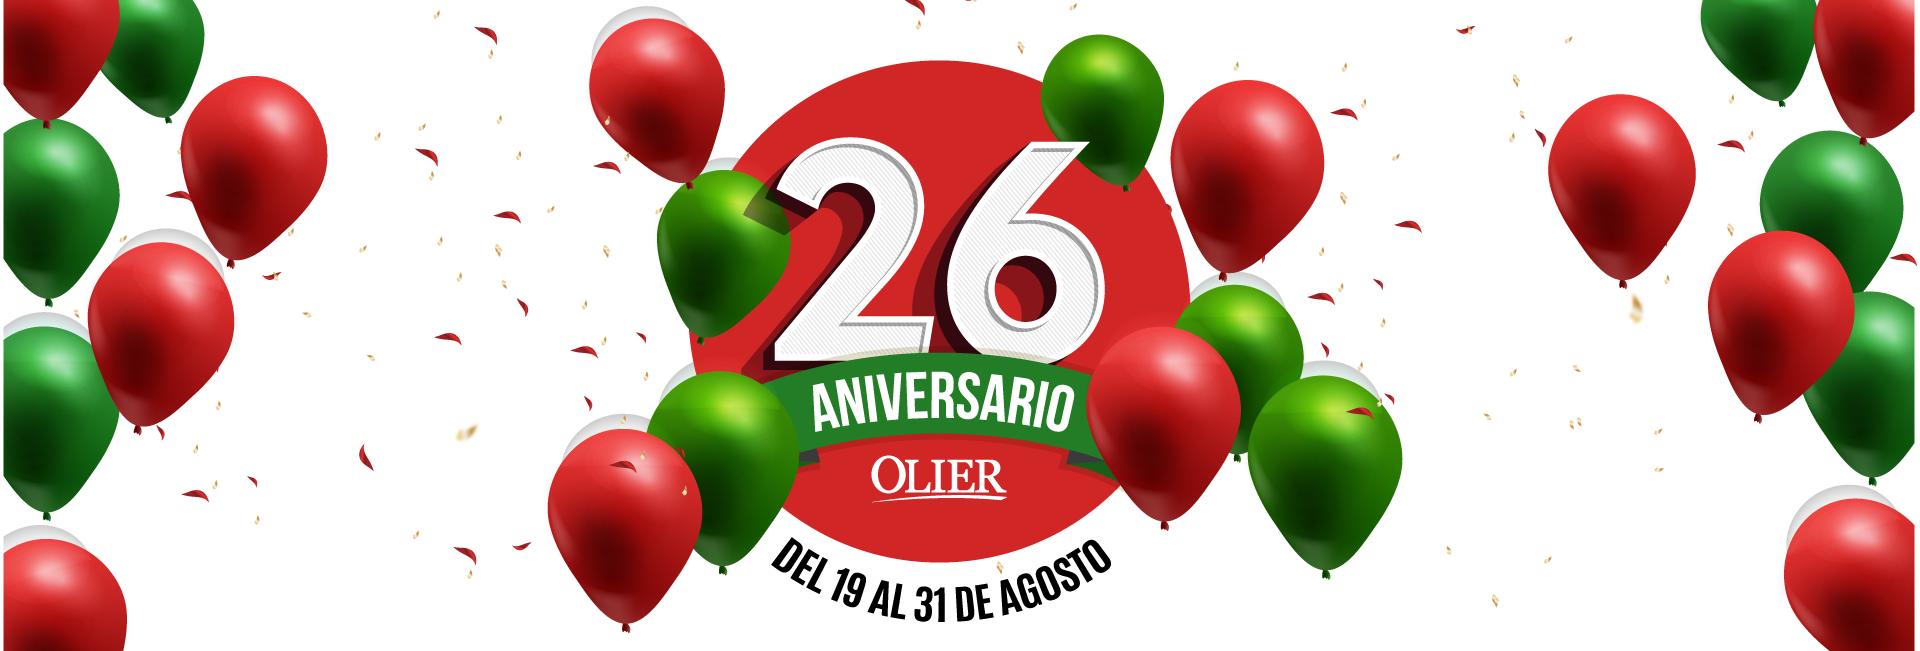 Aniversario 26